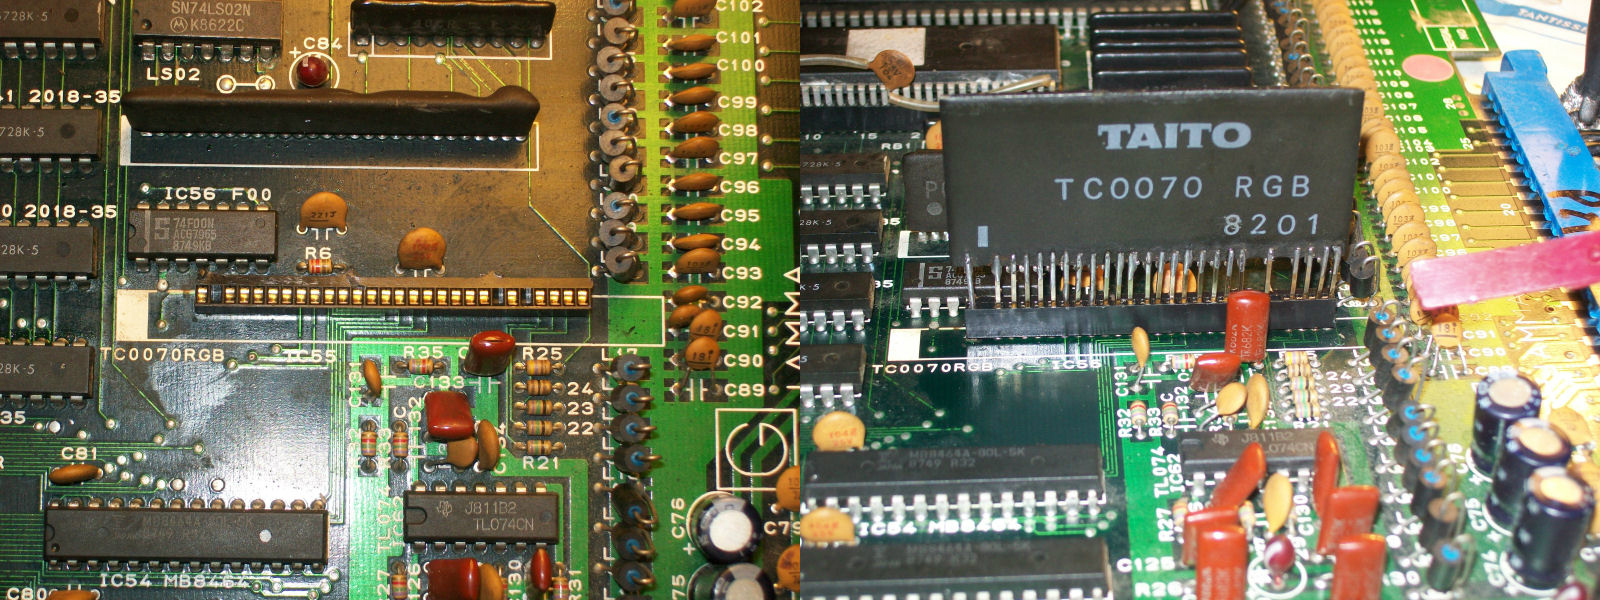 TC0070RGB_installation